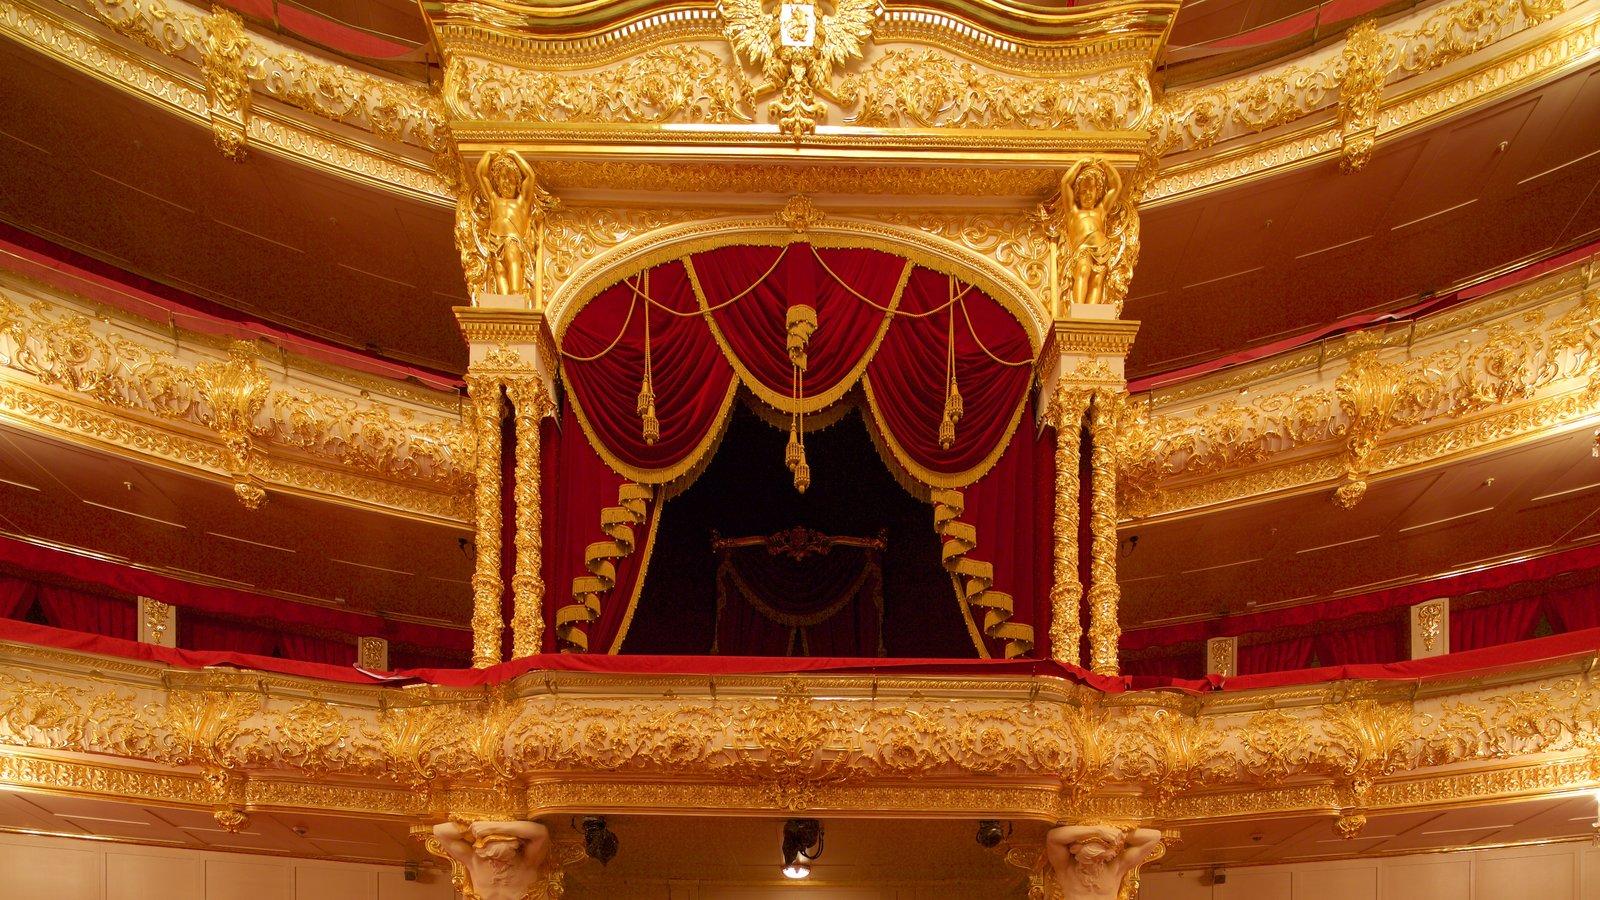 Teatro Bolshoi mostrando arquitetura de patrimônio, vistas internas e cenas de teatro